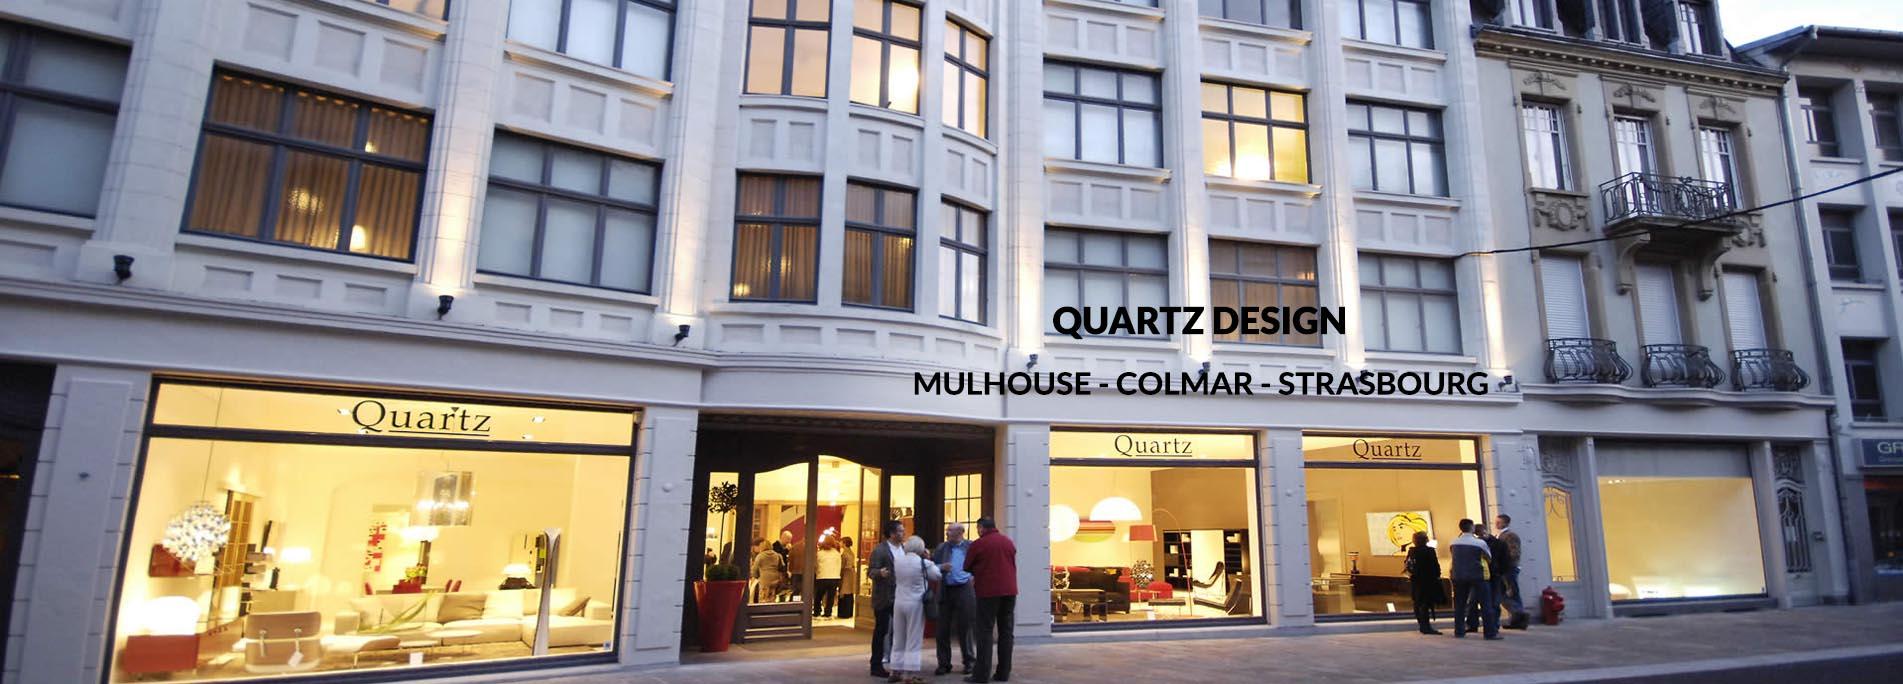 Mobilier Design Et Contemporain A Mulhouse Colmar Strasbourg Quartz Design